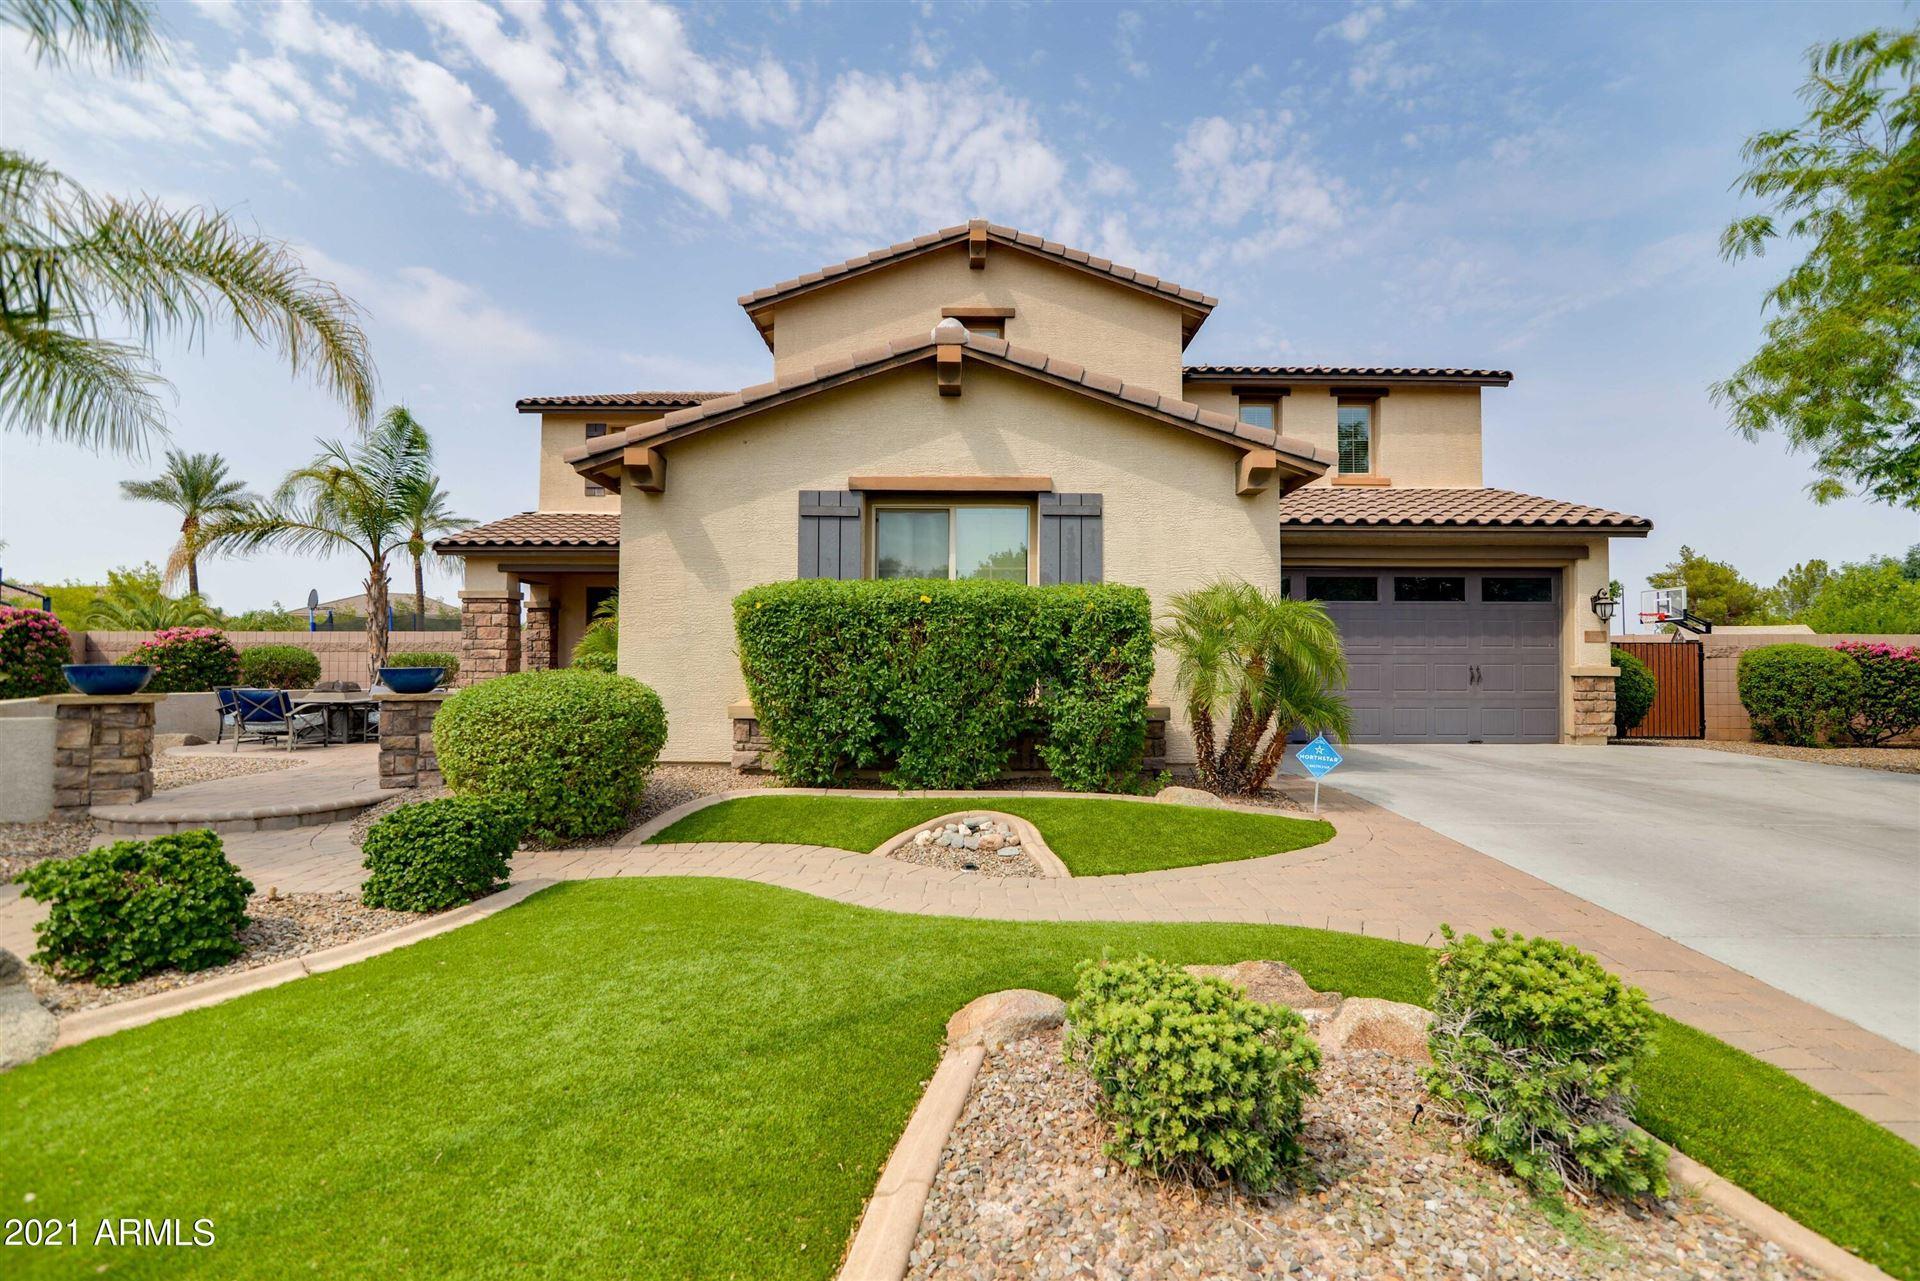 4510 S SEA BREEZE Place, Chandler, AZ 85248 - MLS#: 6269173